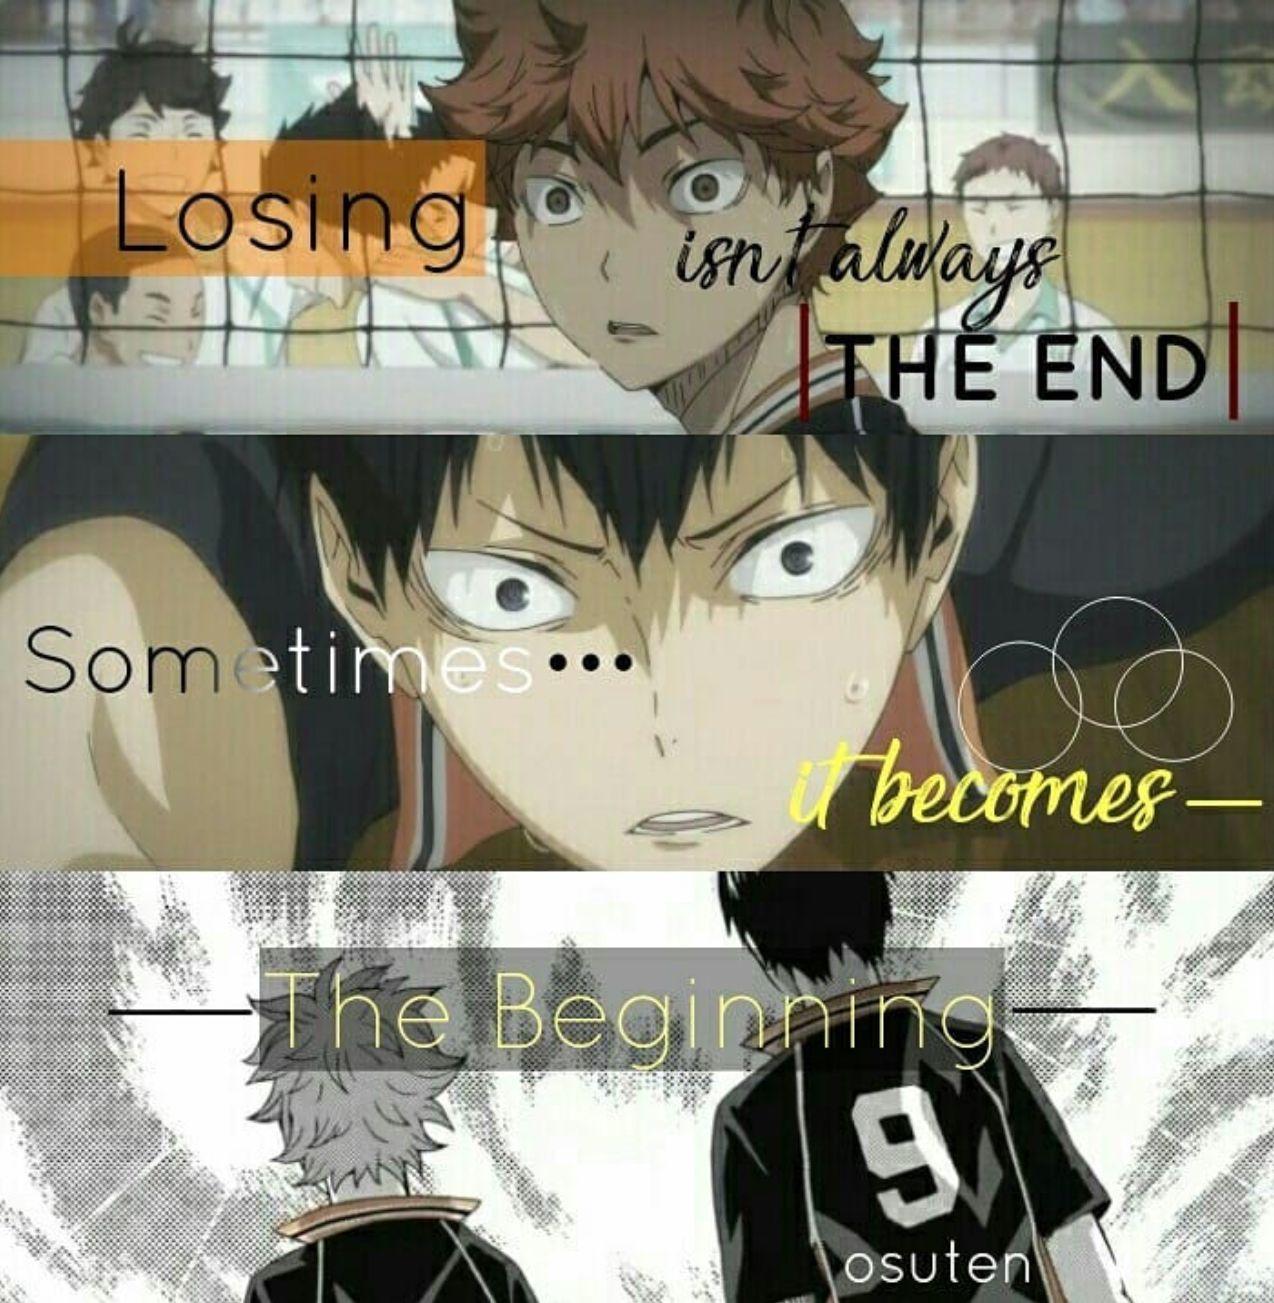 Haikyuu Anime Quote Haikyuu manga, Anime quotes